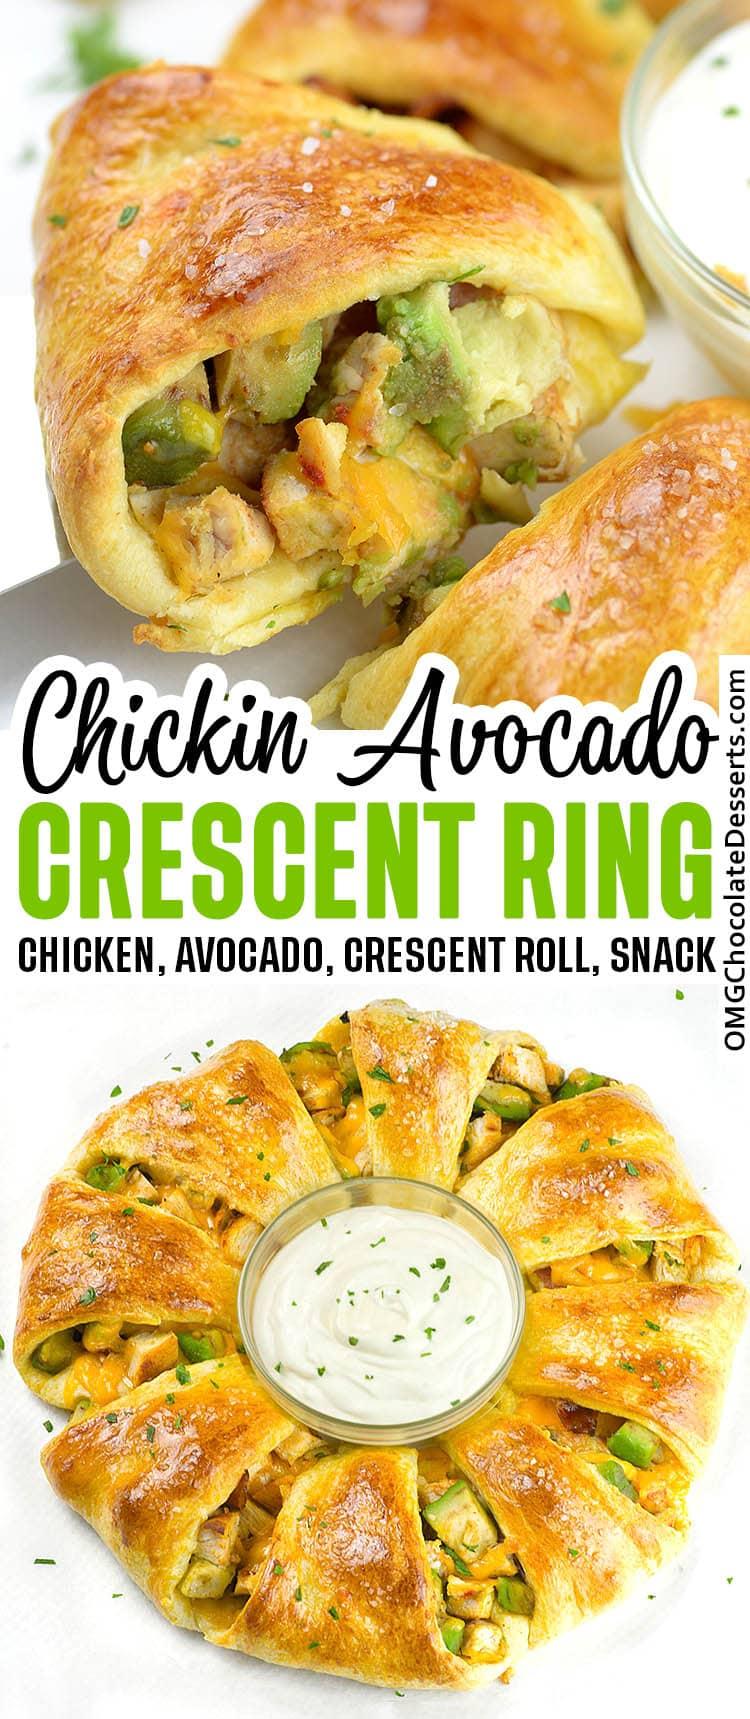 Chicken-Avocado Crescent Ring